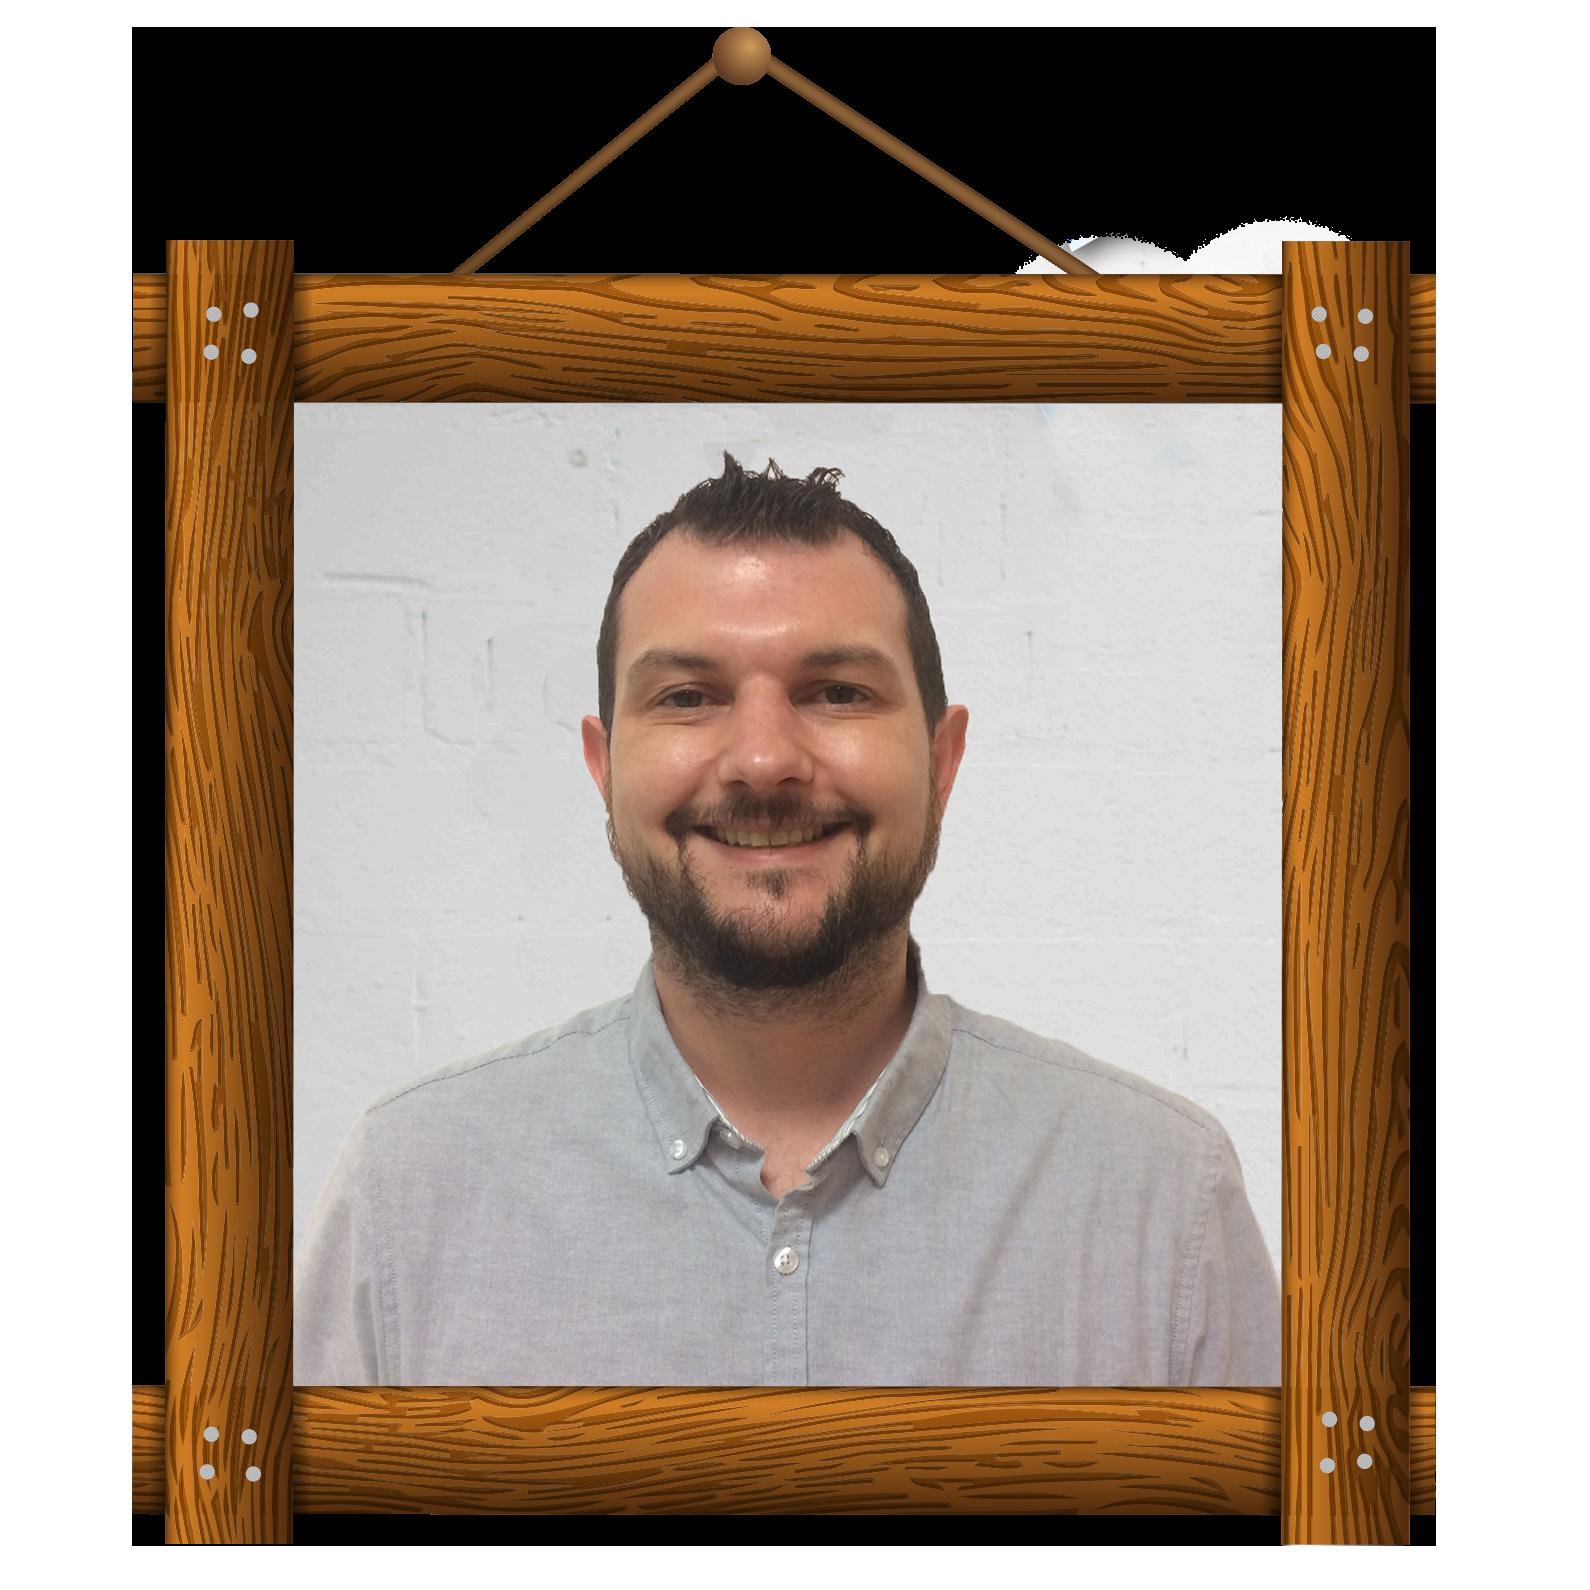 Scott, profesor nativo de inglés en la academia de inglés de Zaragoza: Number 16 School San Miguel